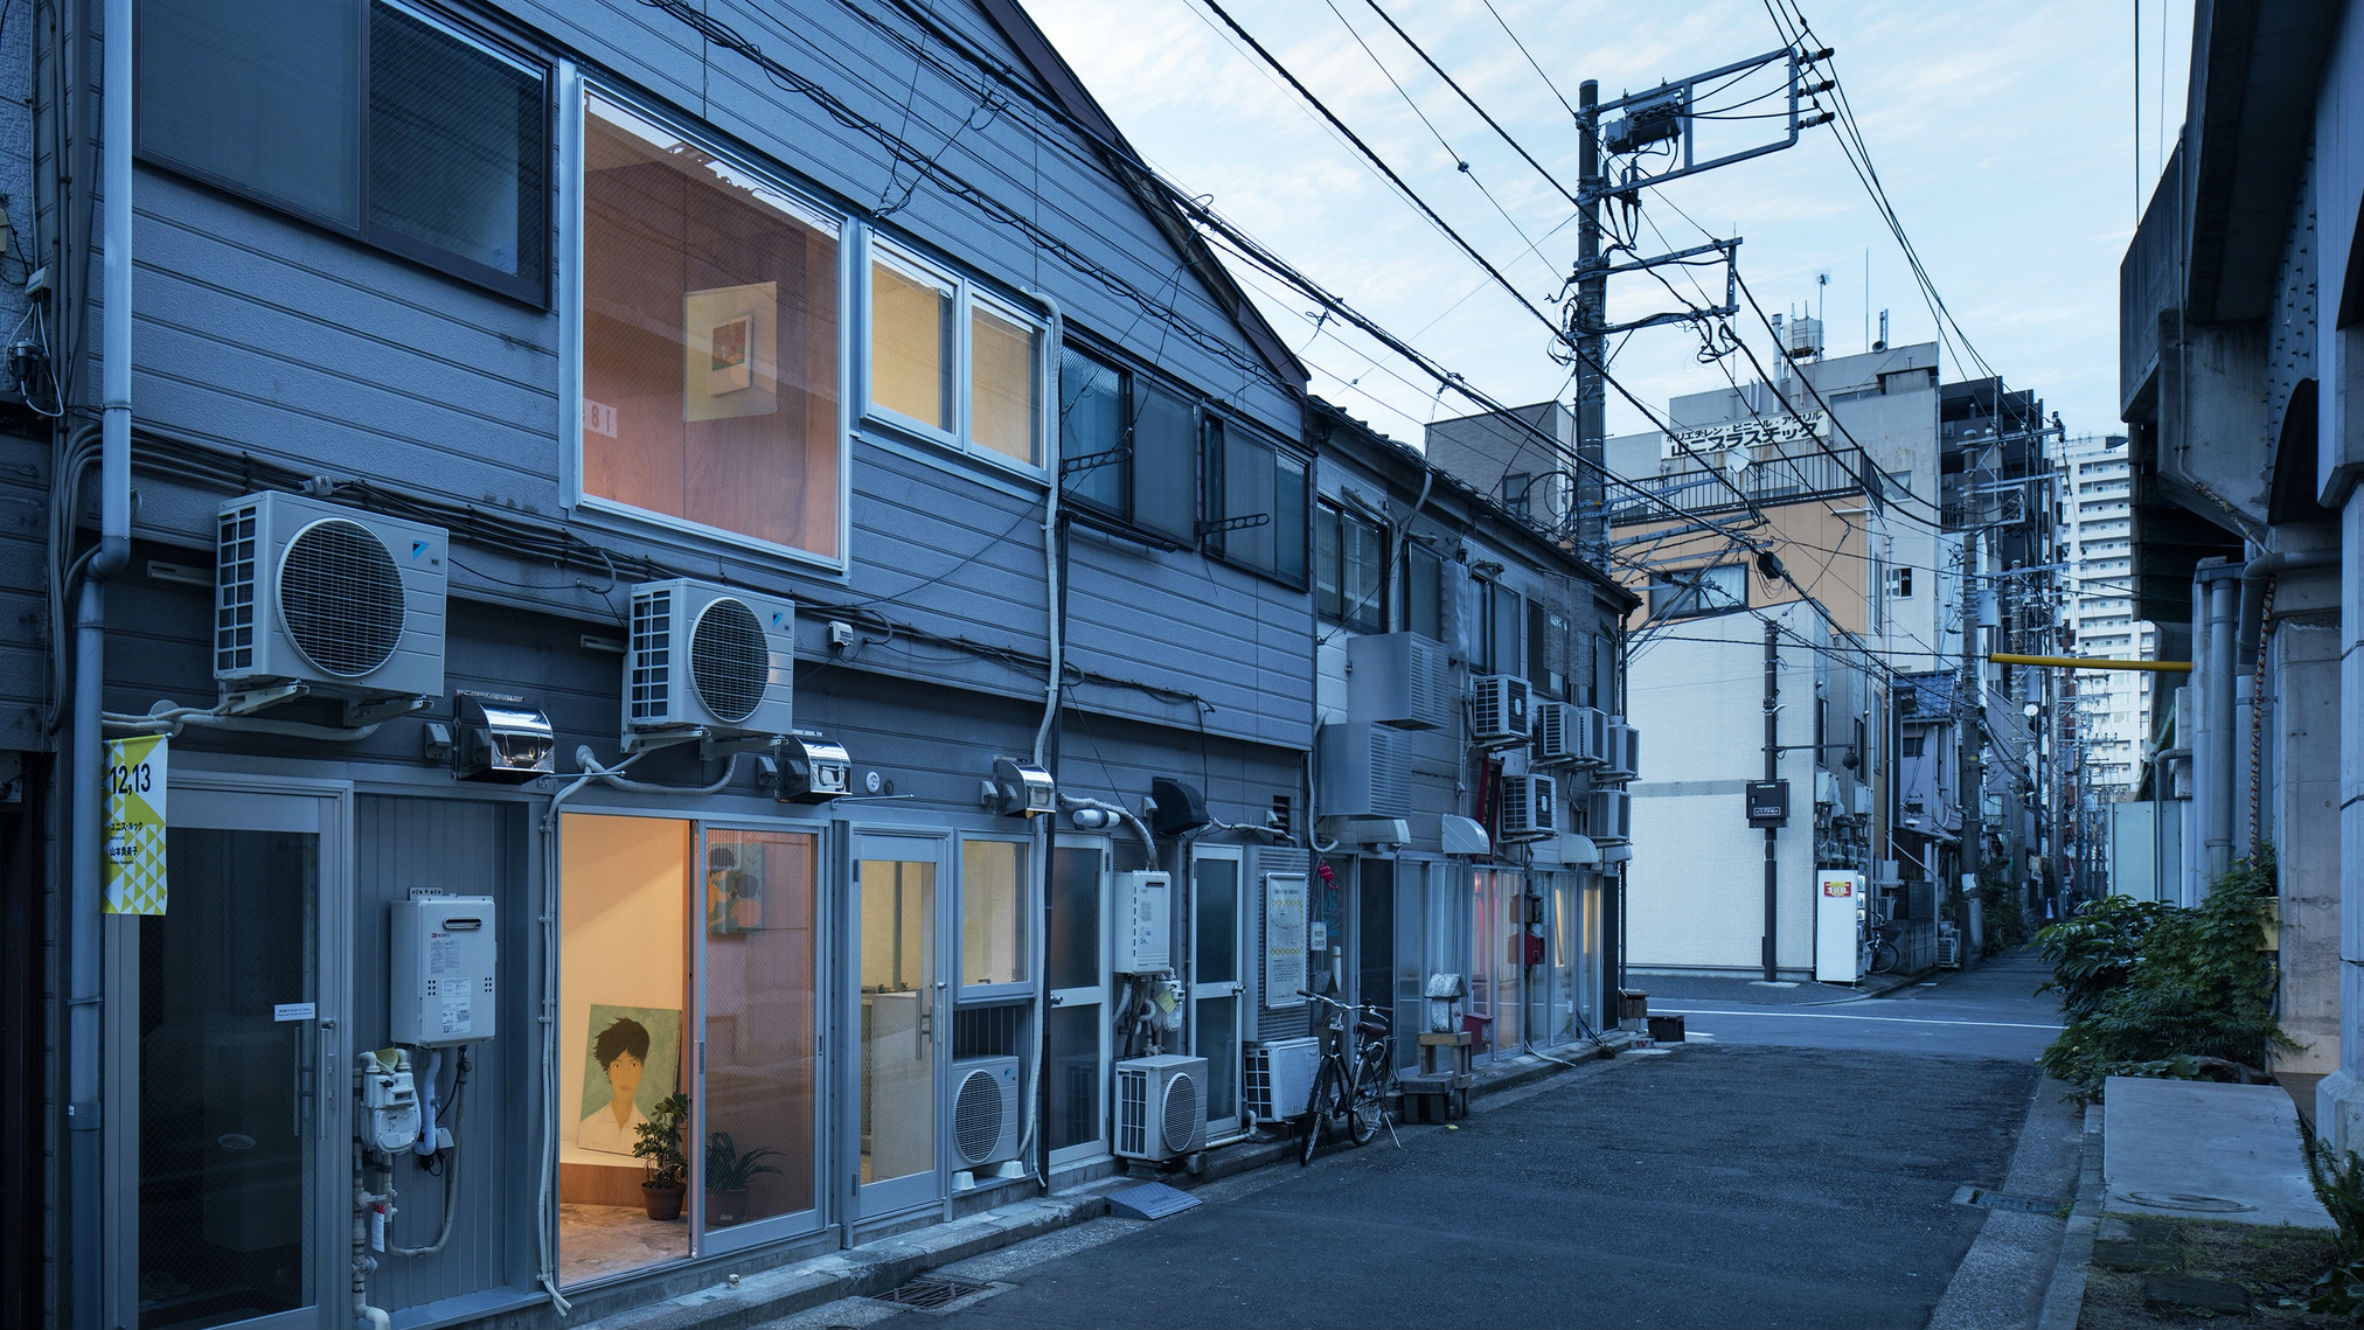 Cut, Koganecho, Japan, by Yusuke Kakinoki+Shuhei Hirooka, Persimmonhills Architects, Netherlands, by i29